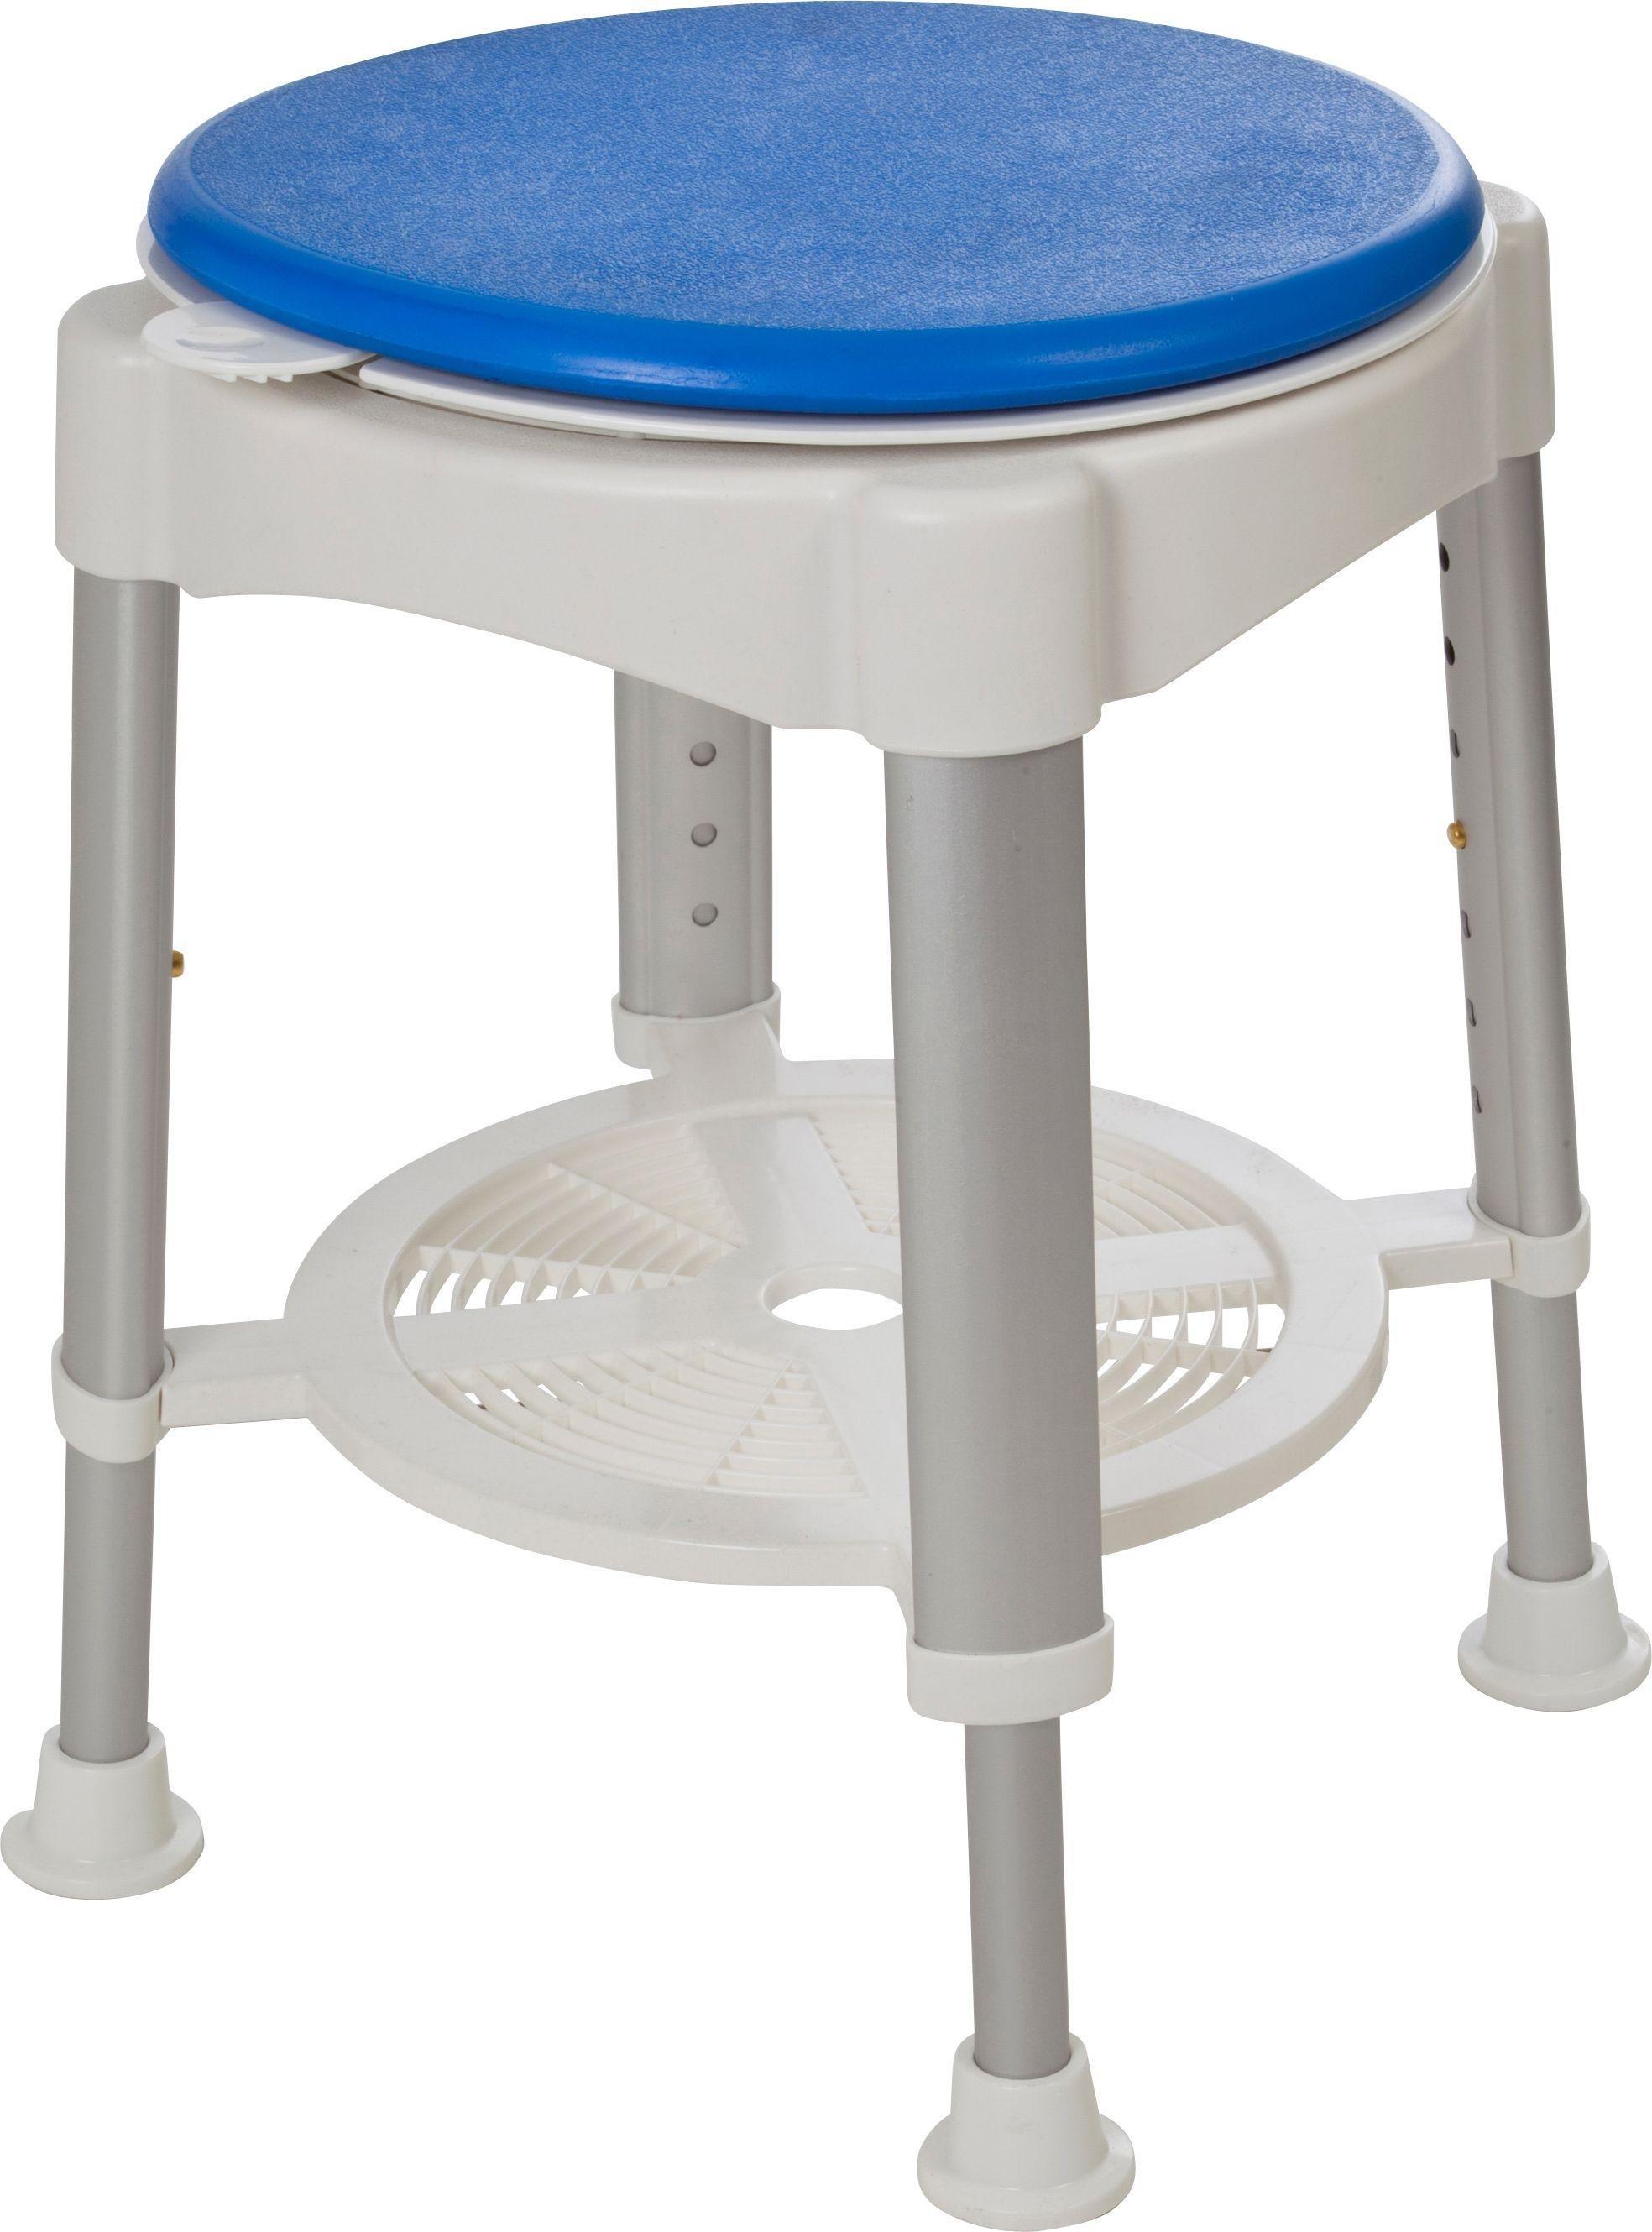 round shower stool rotating seat - Shower Stool